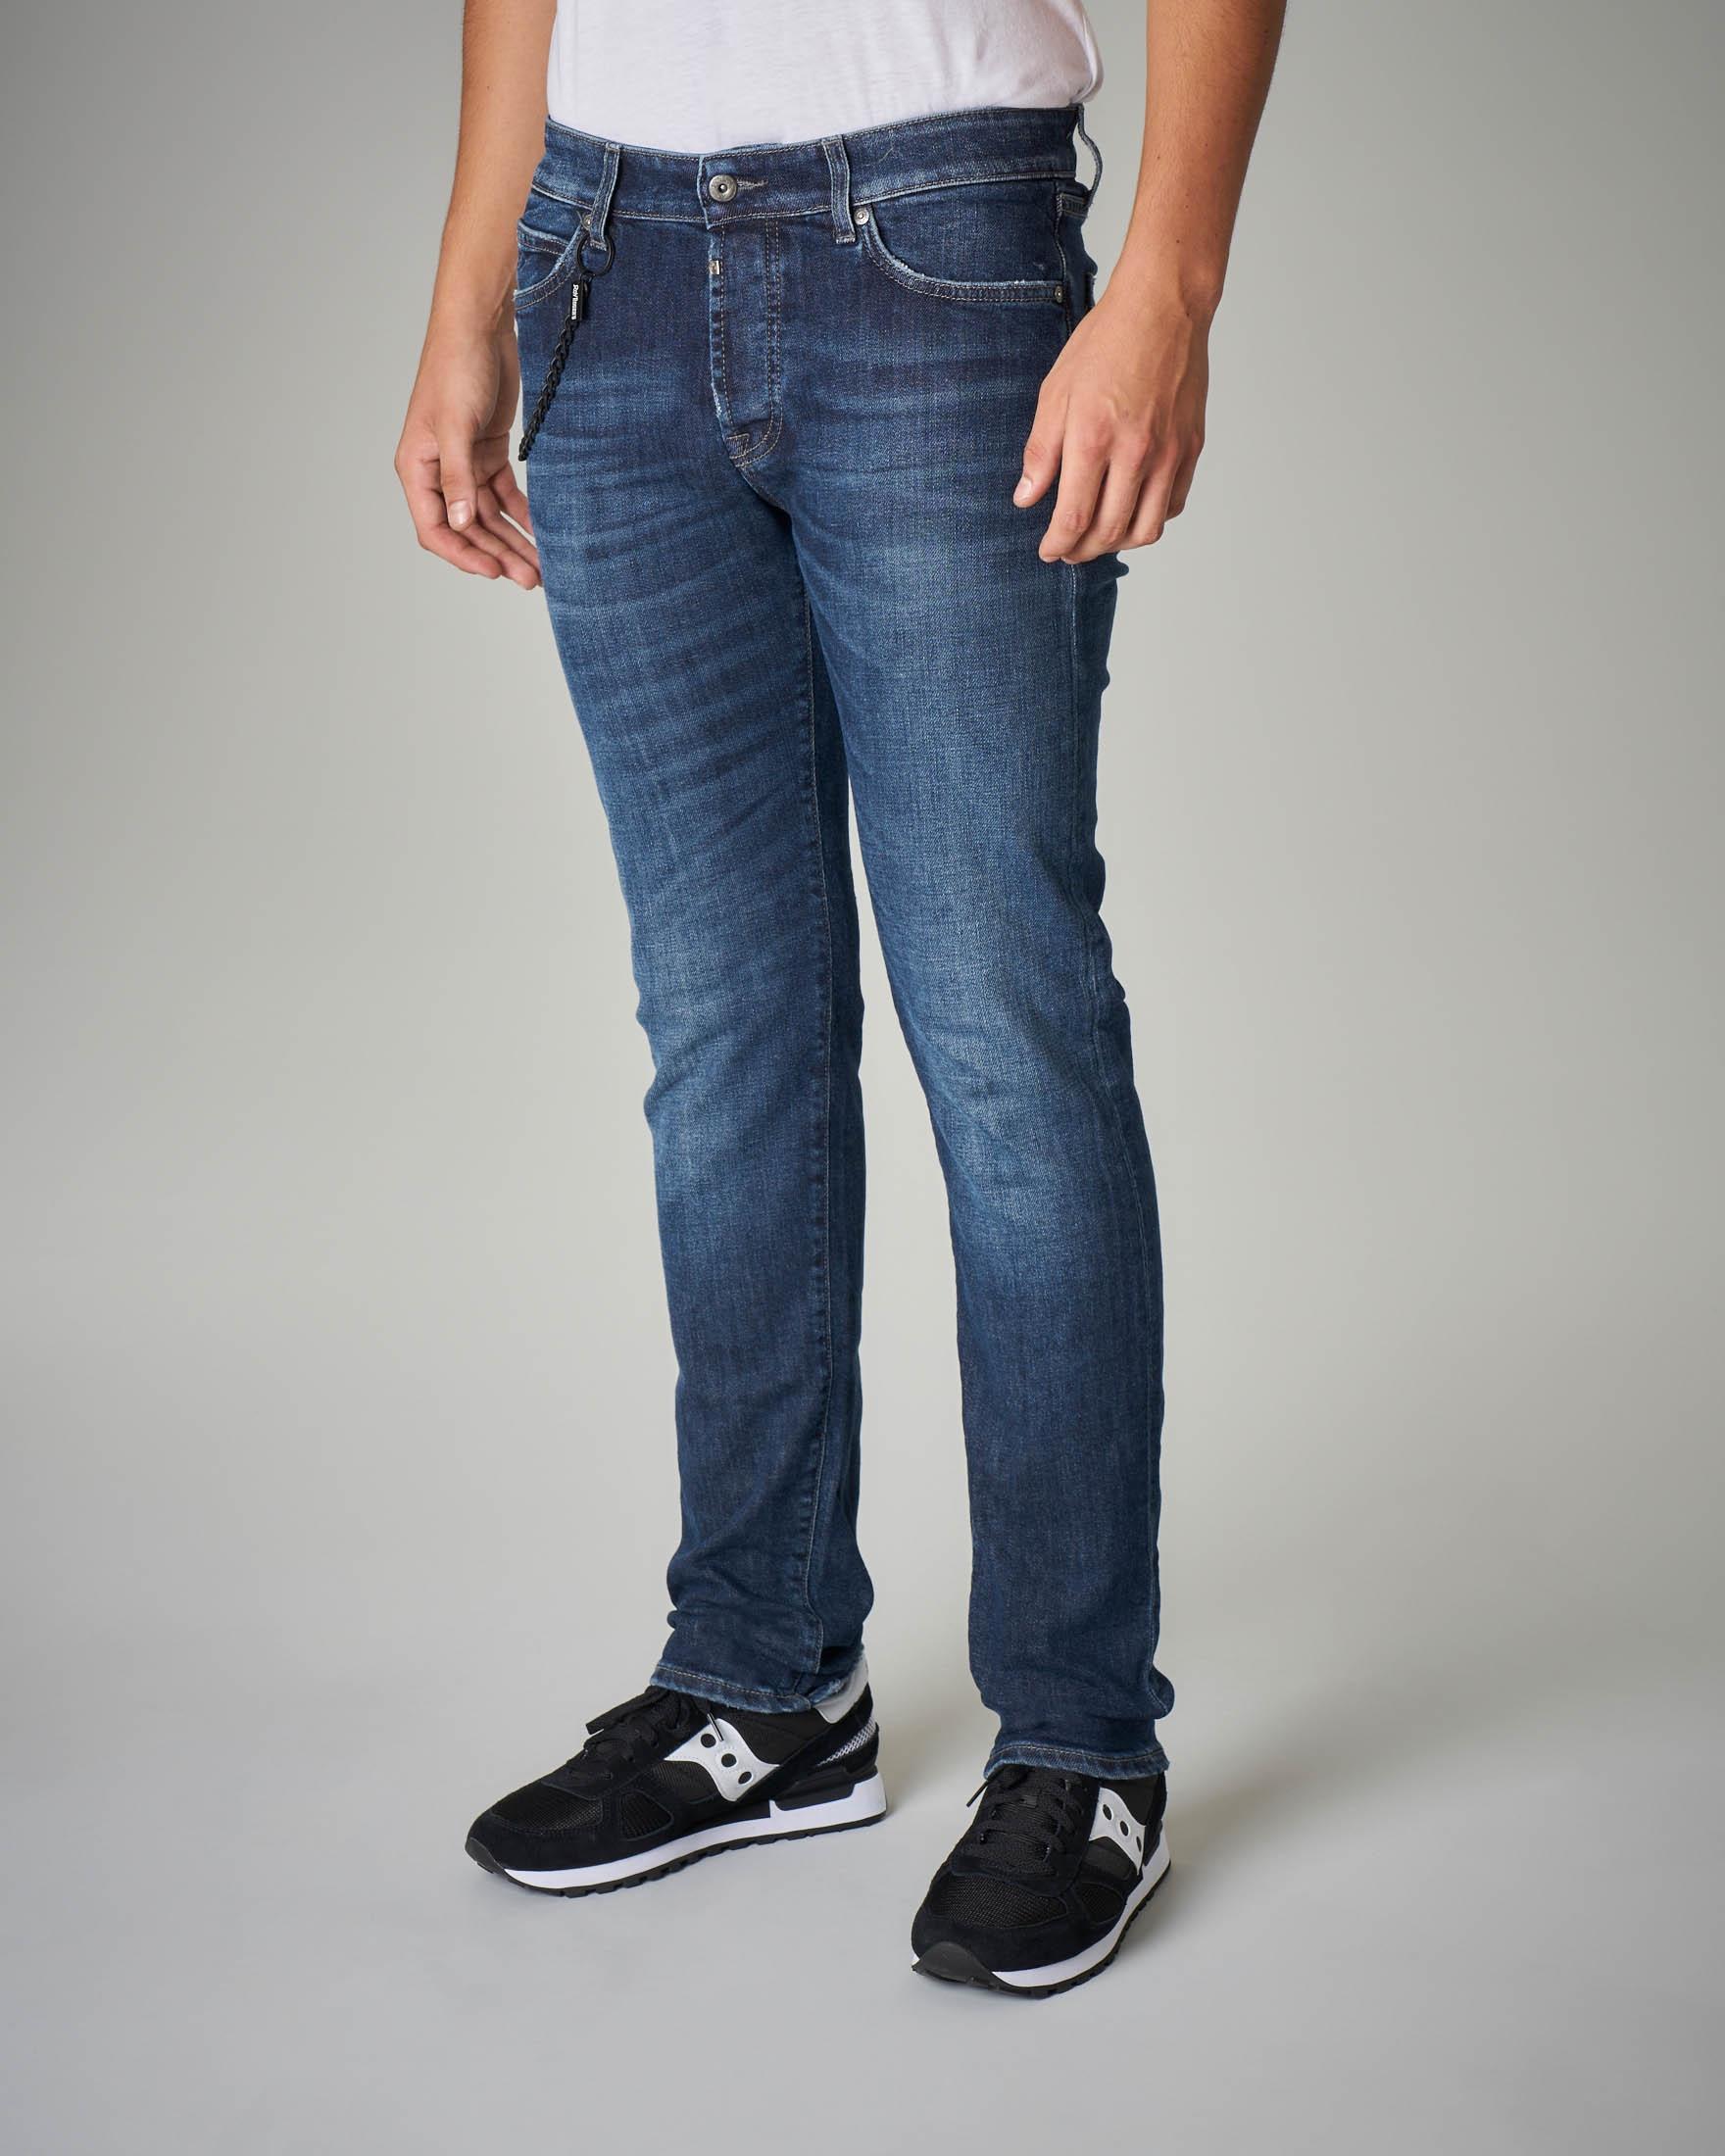 Jeans linea Deluxe vita media